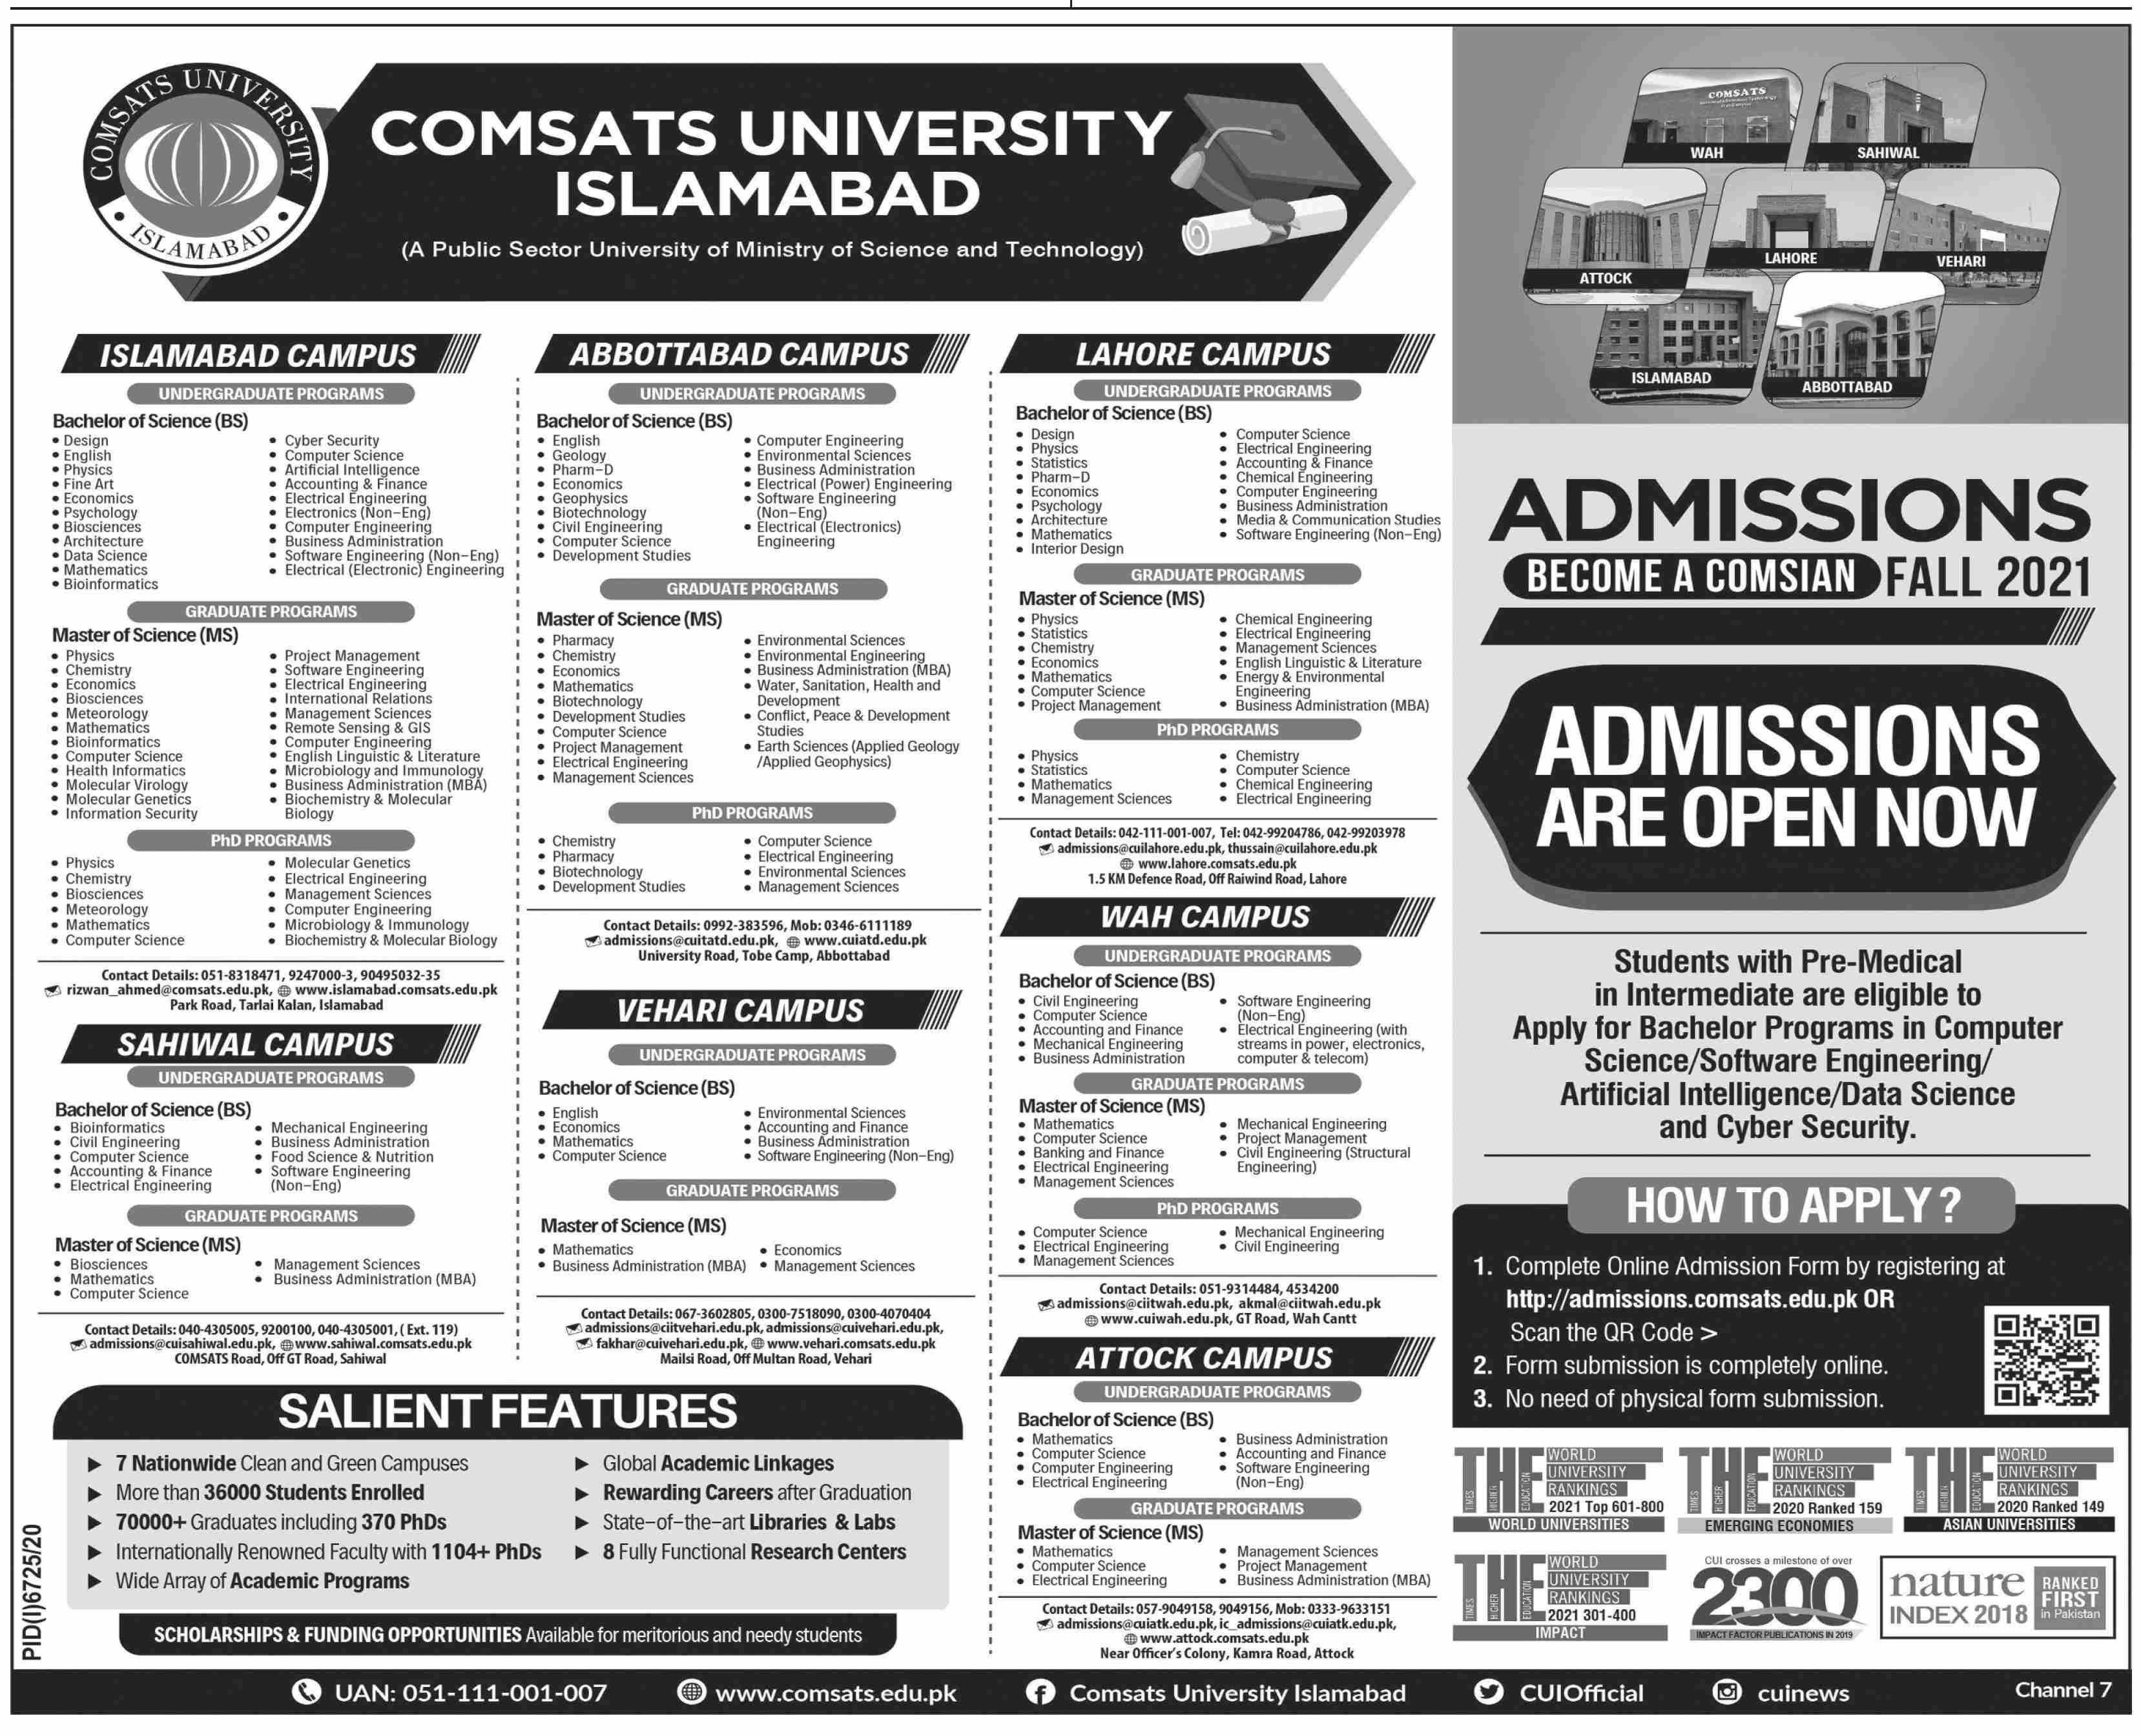 Comsats University Islamabad Admissions